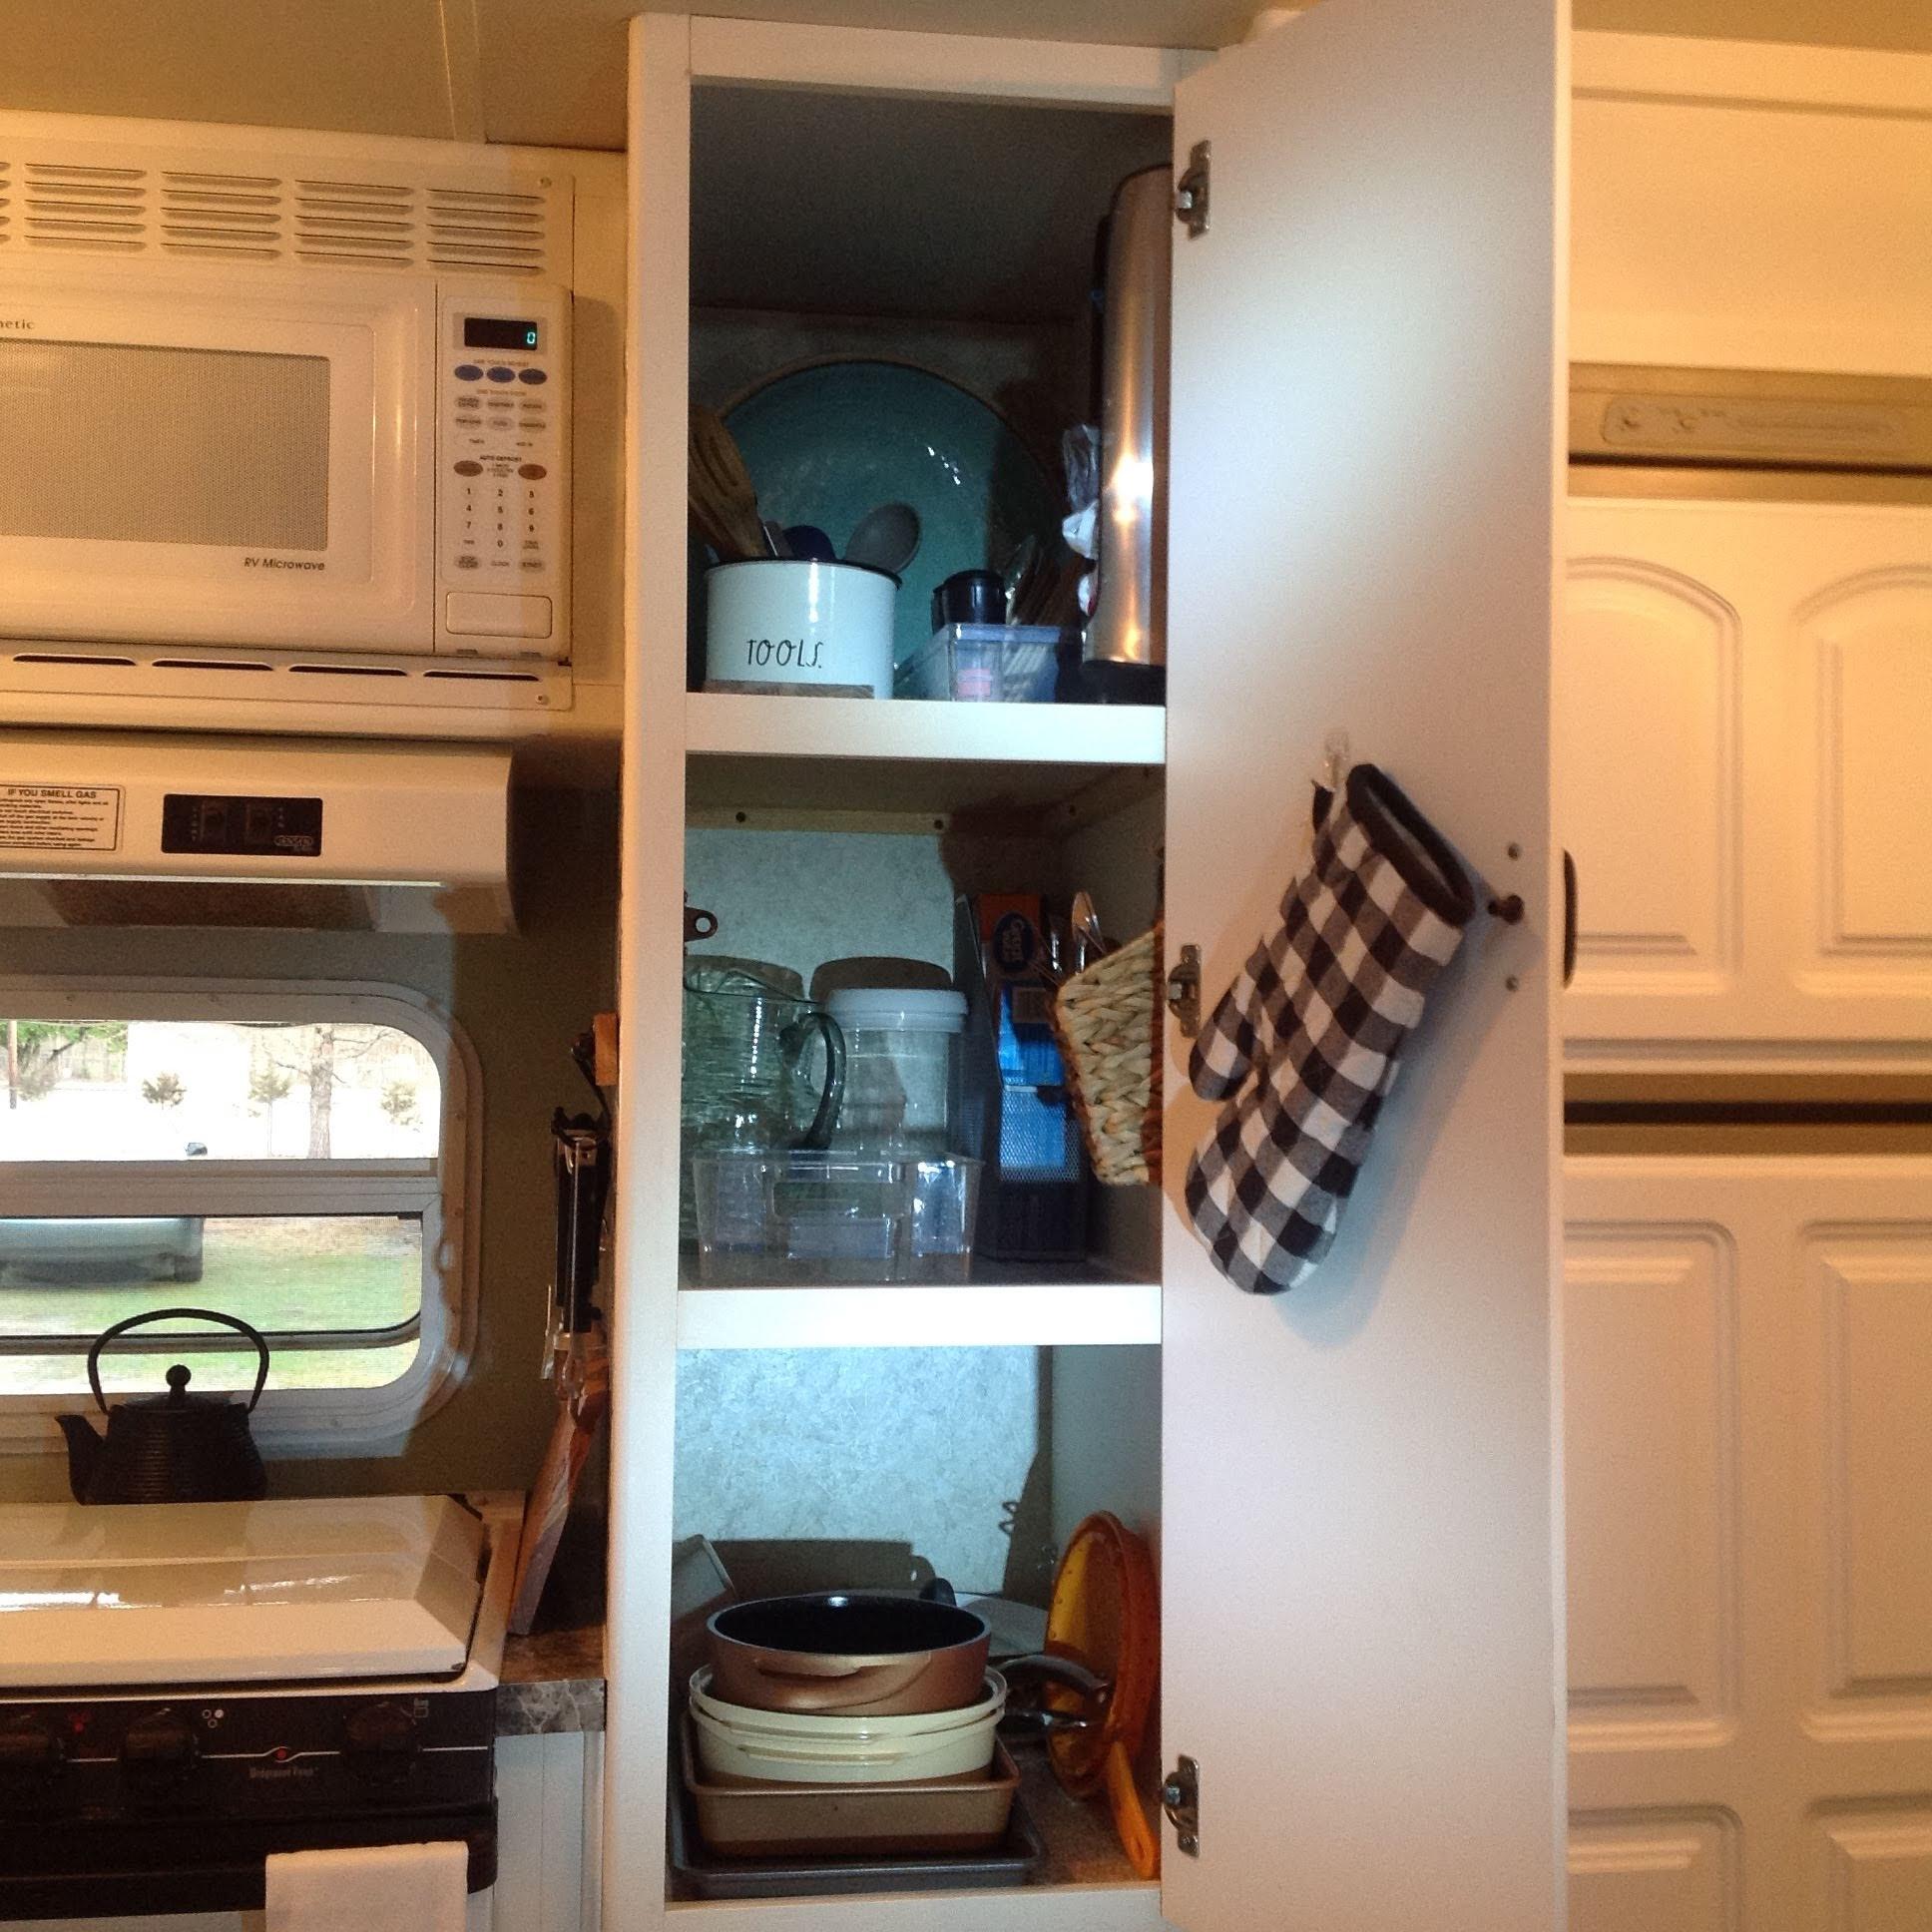 Fully stocked kitchen: plates, bowls, silverware, pots, pans, utensils, measuring cups, etc. . Starcraft Aruba 2003